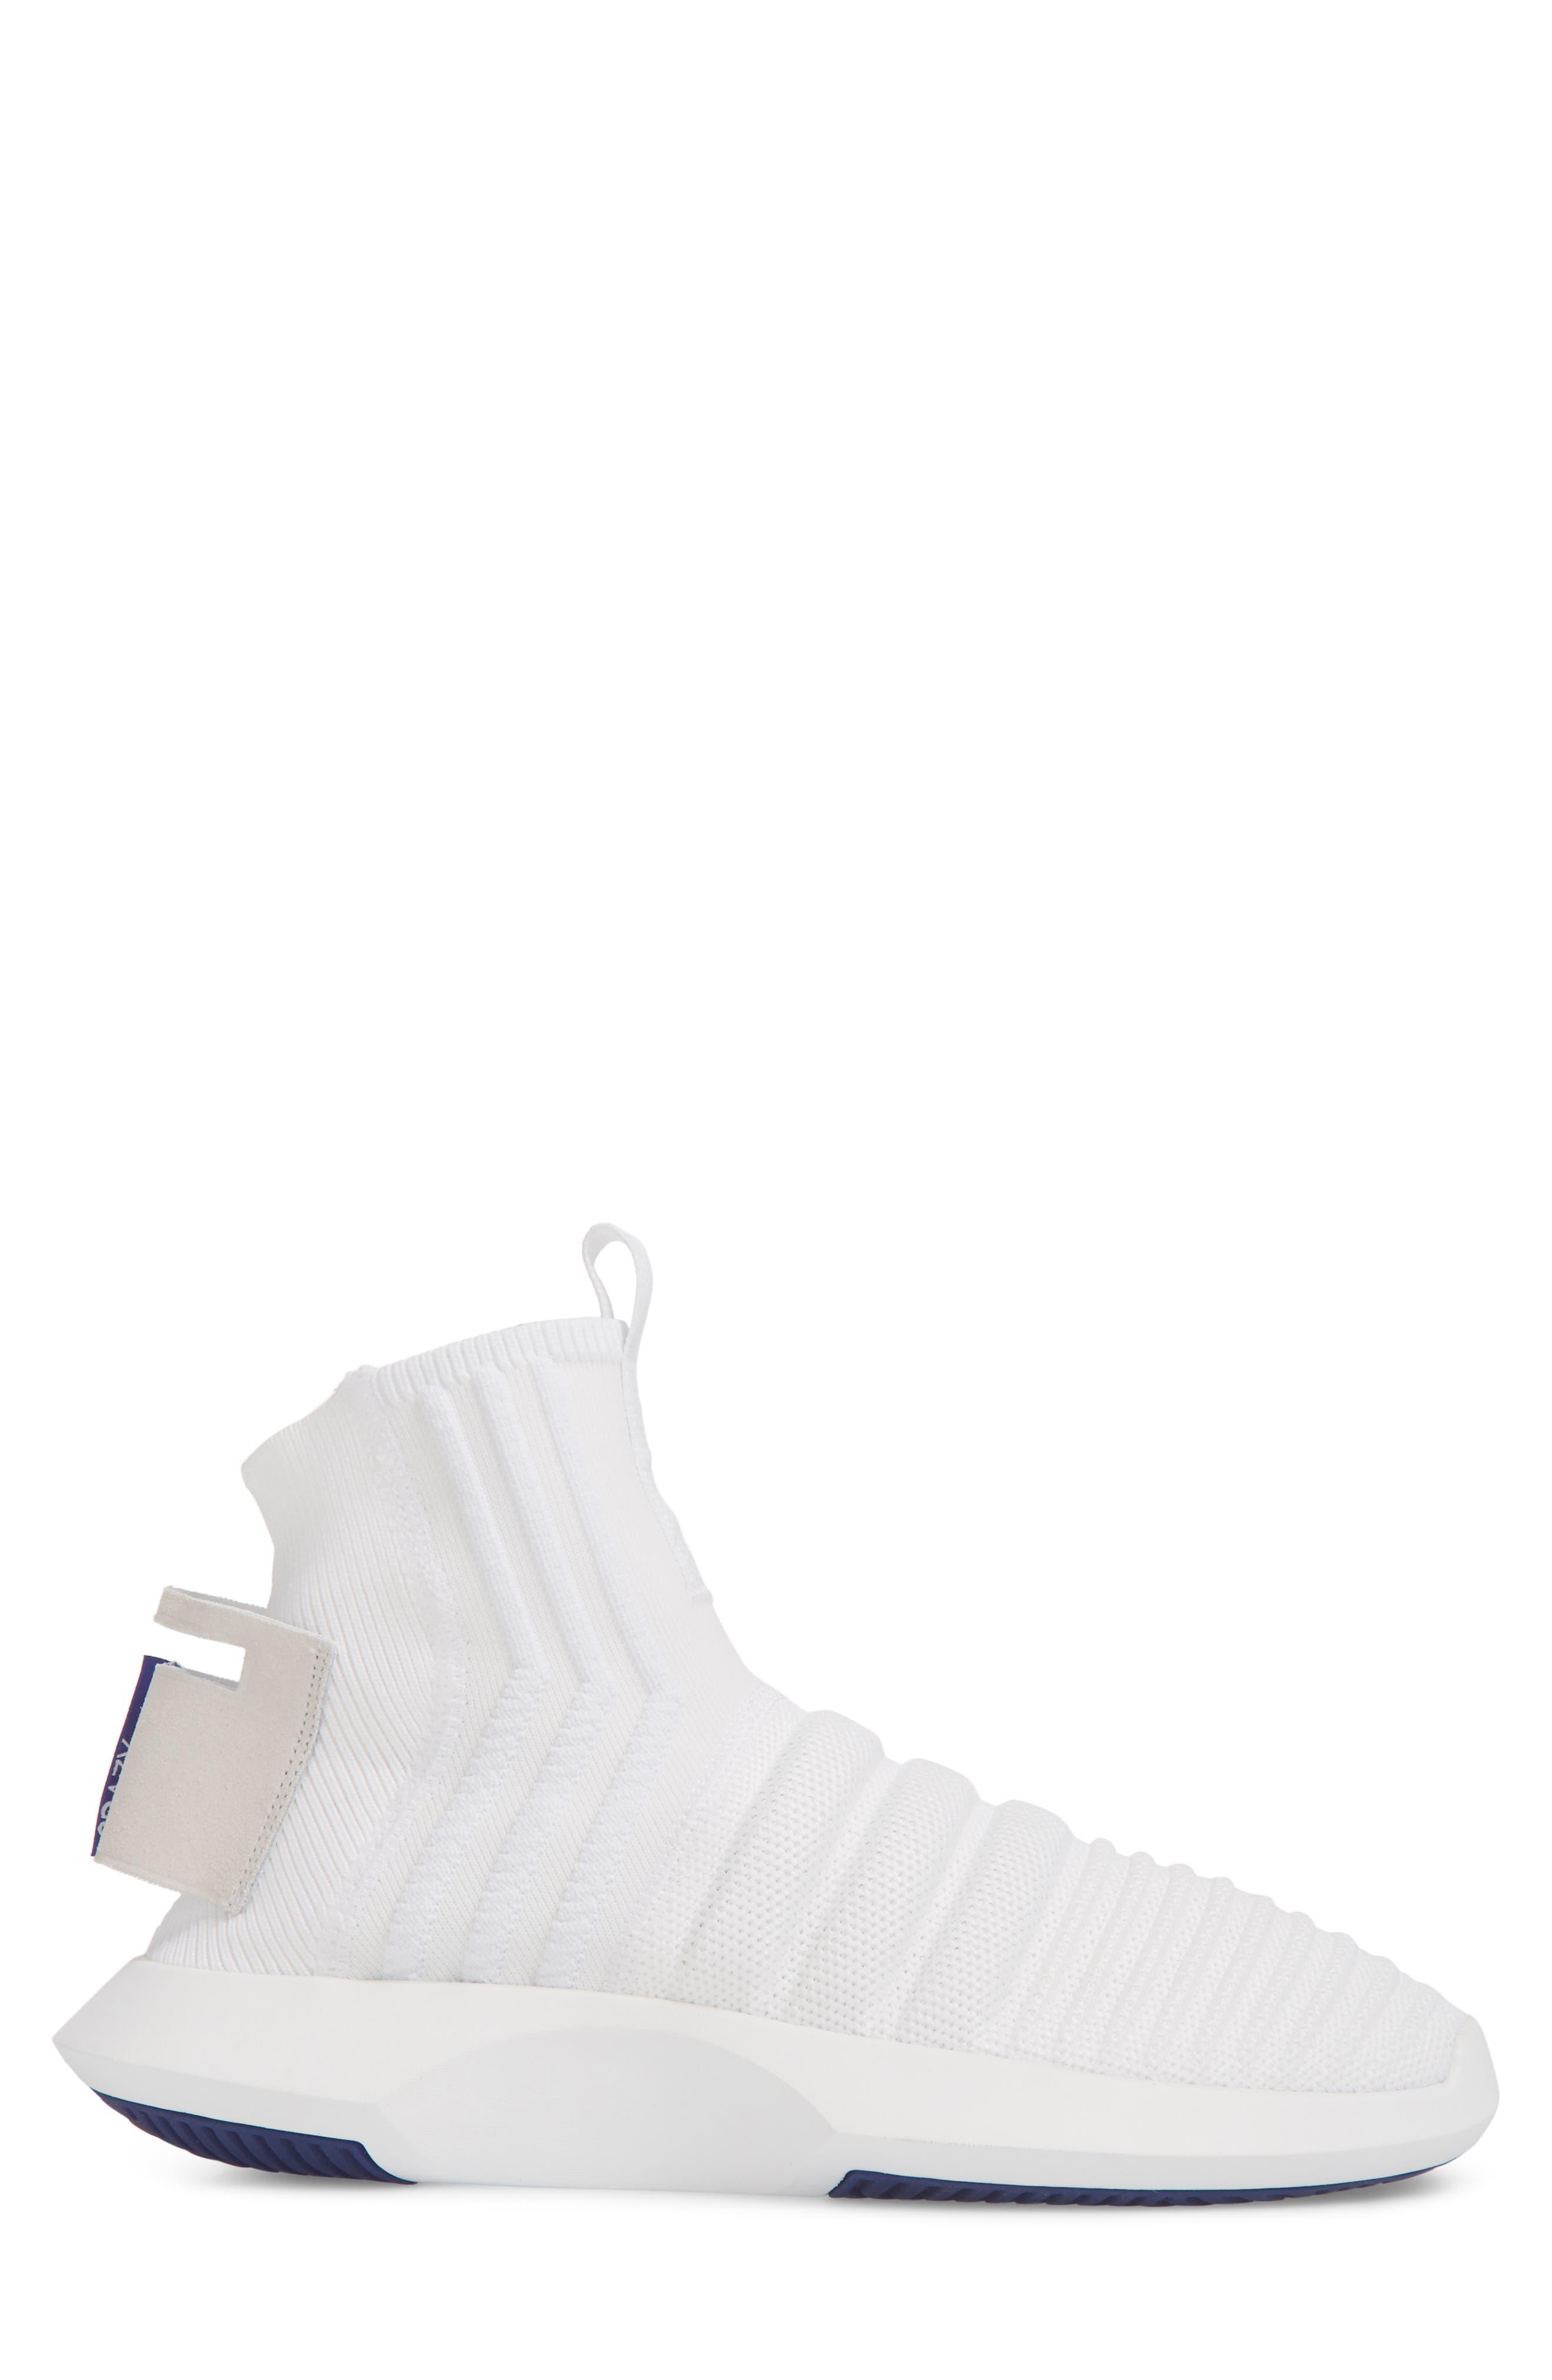 Crazy 1 ADV Sock Primeknit Sneaker,                             Alternate thumbnail 3, color,                             White/ Real Purple